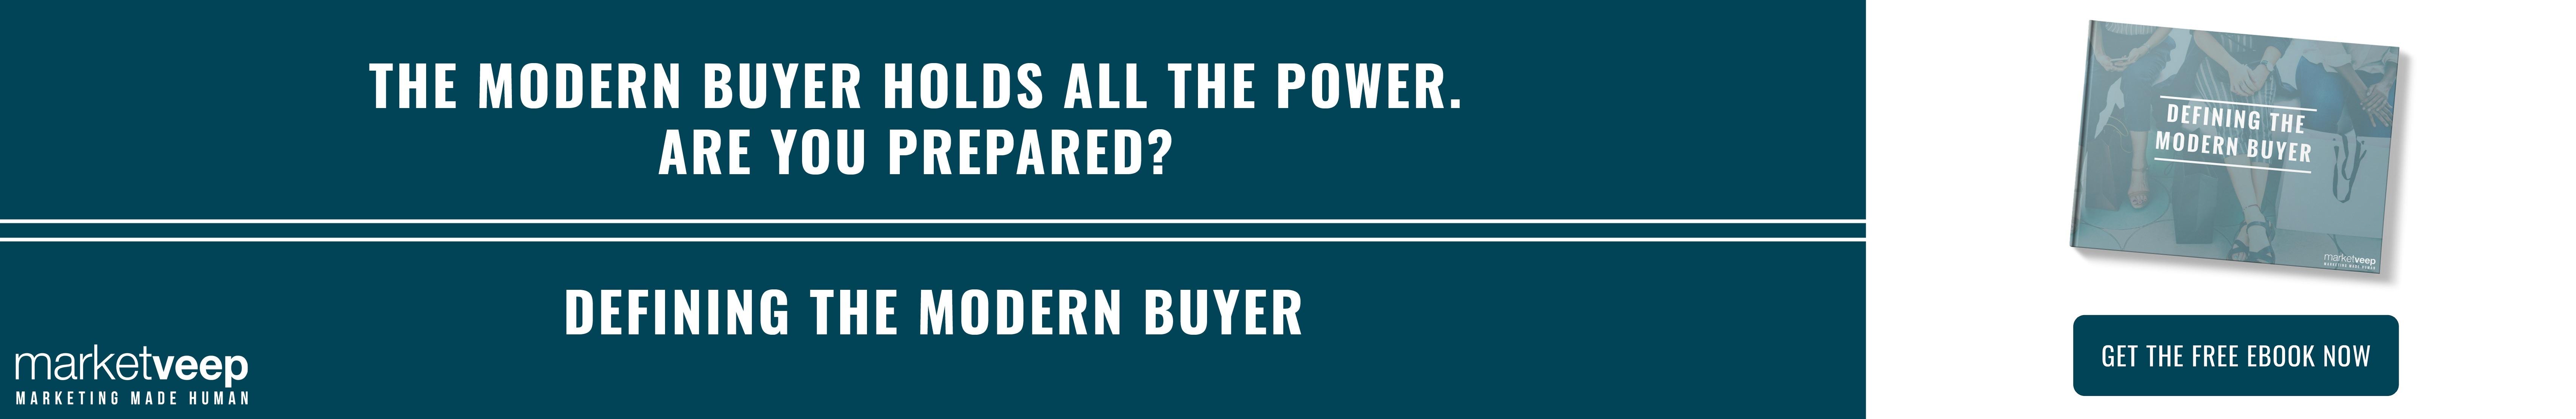 Defining the Modern Buyer